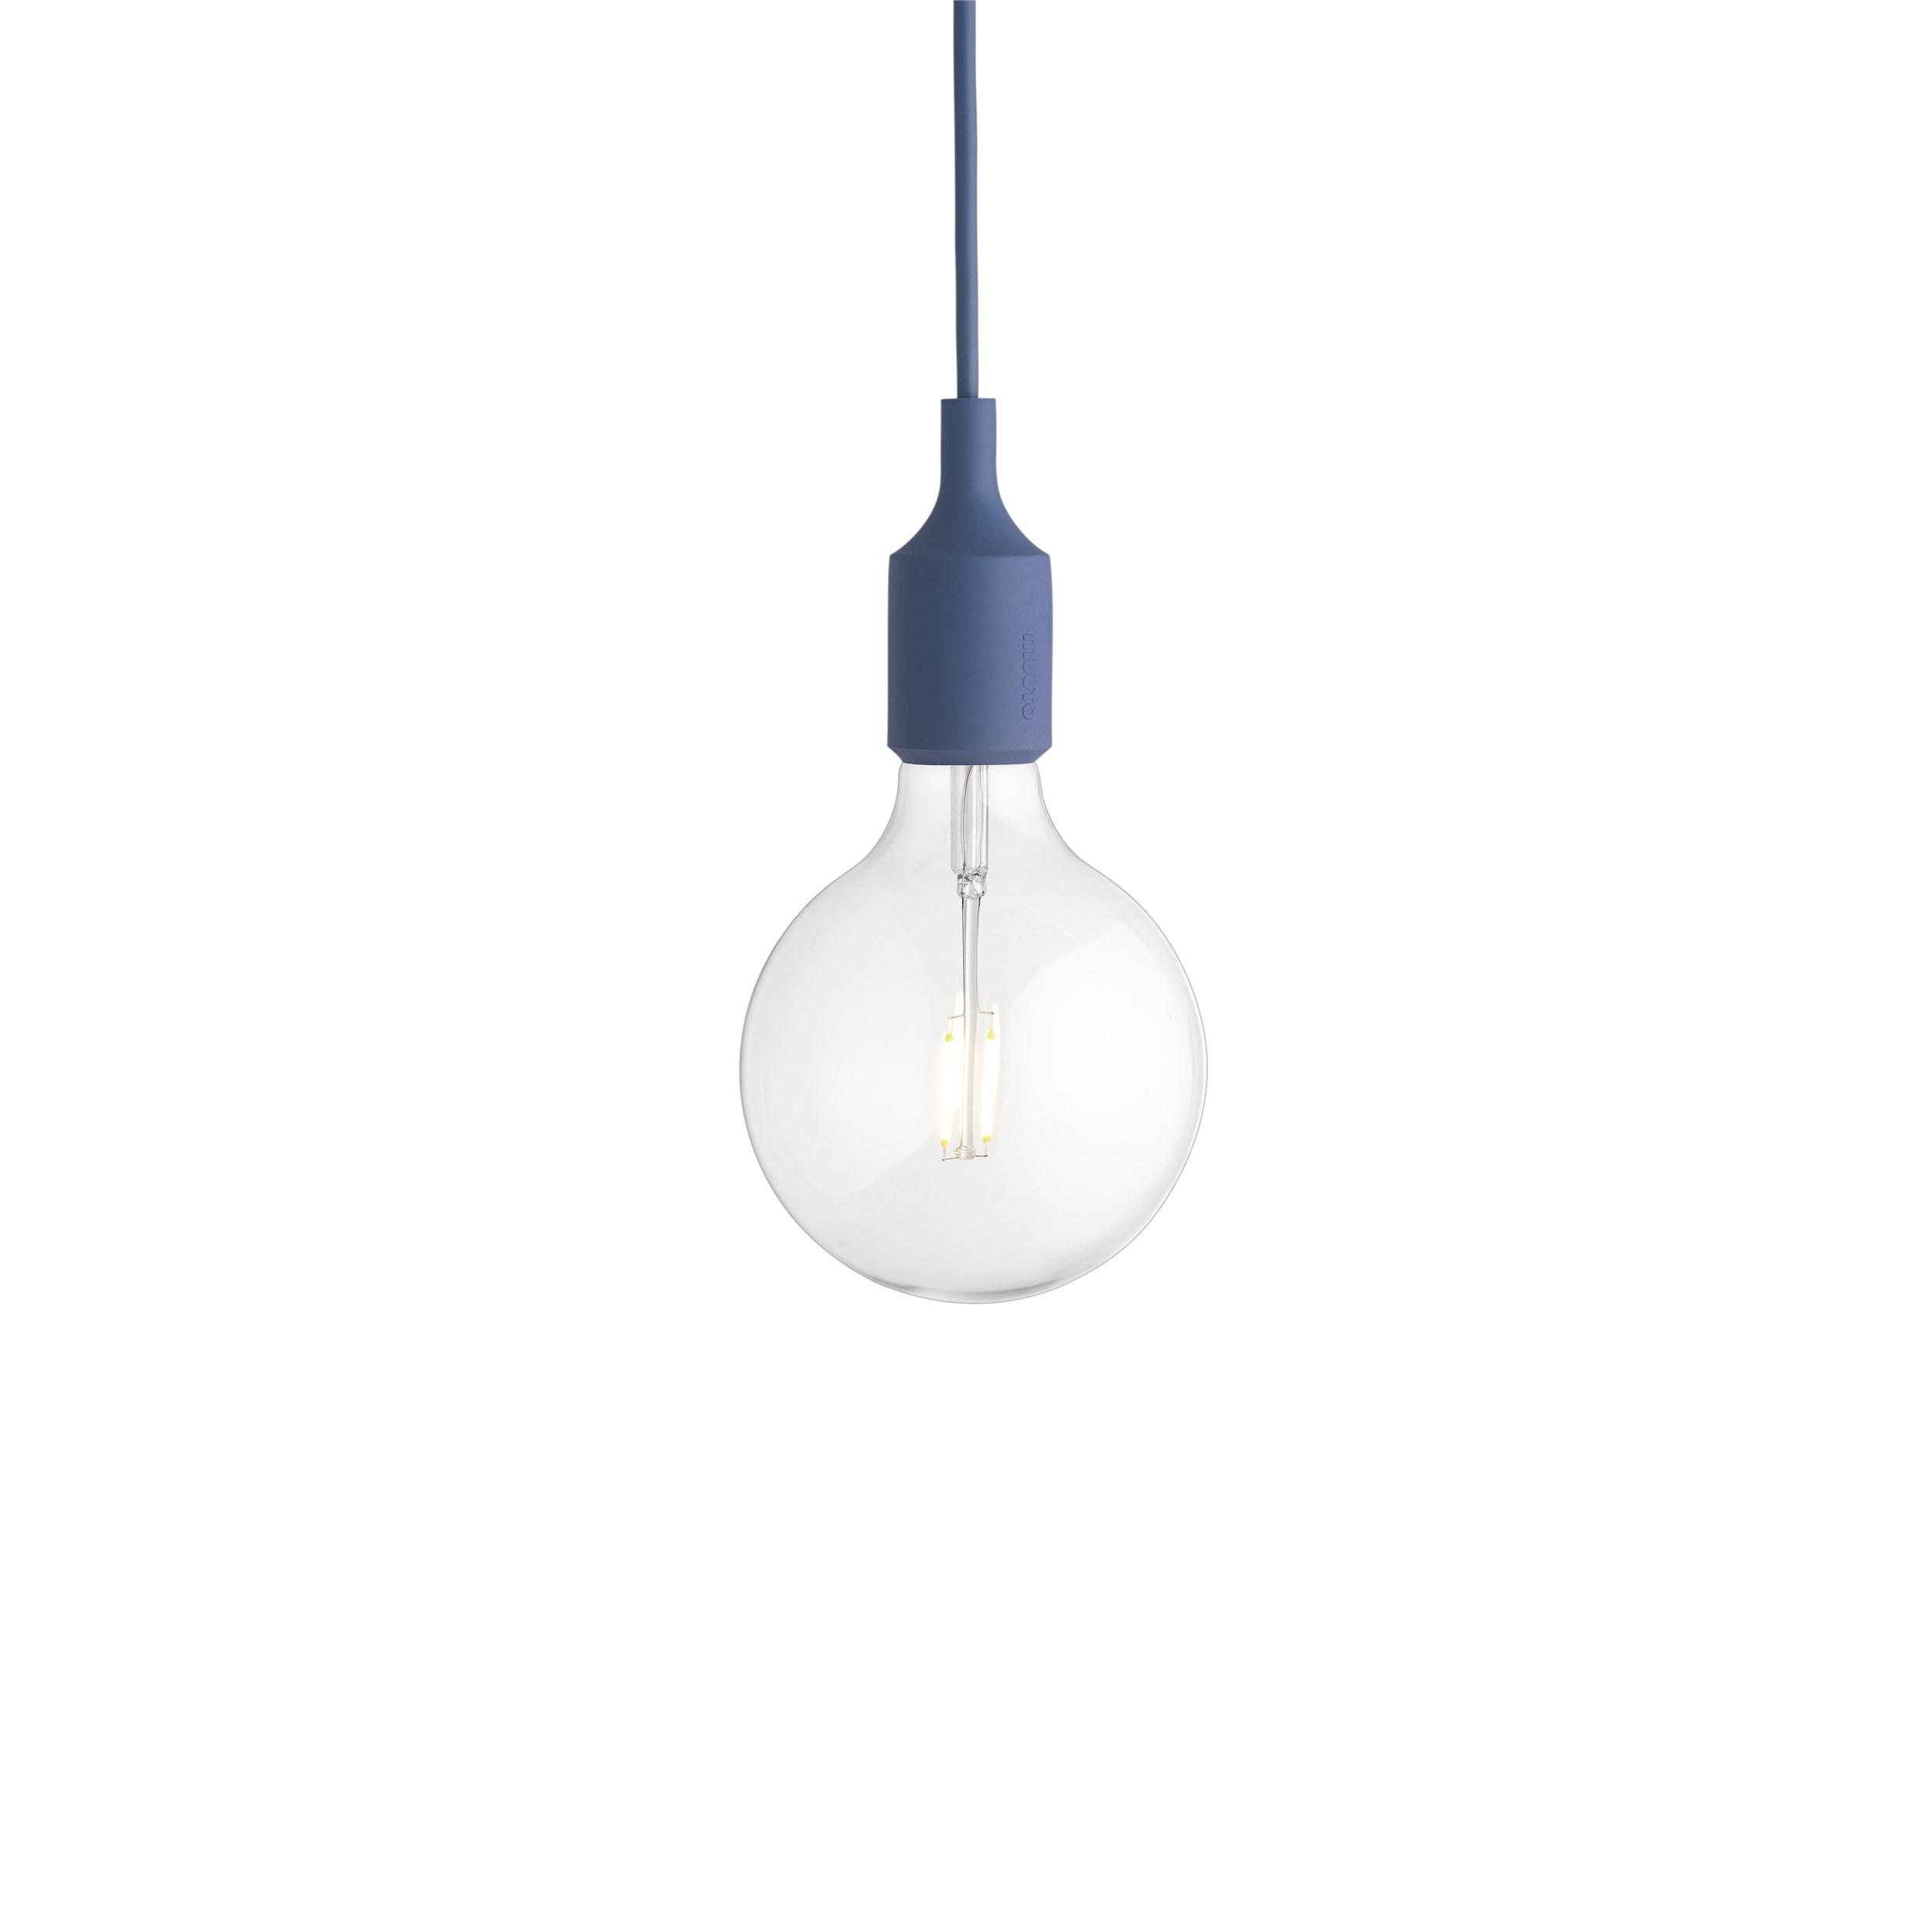 E27 pendant lamp pale blue